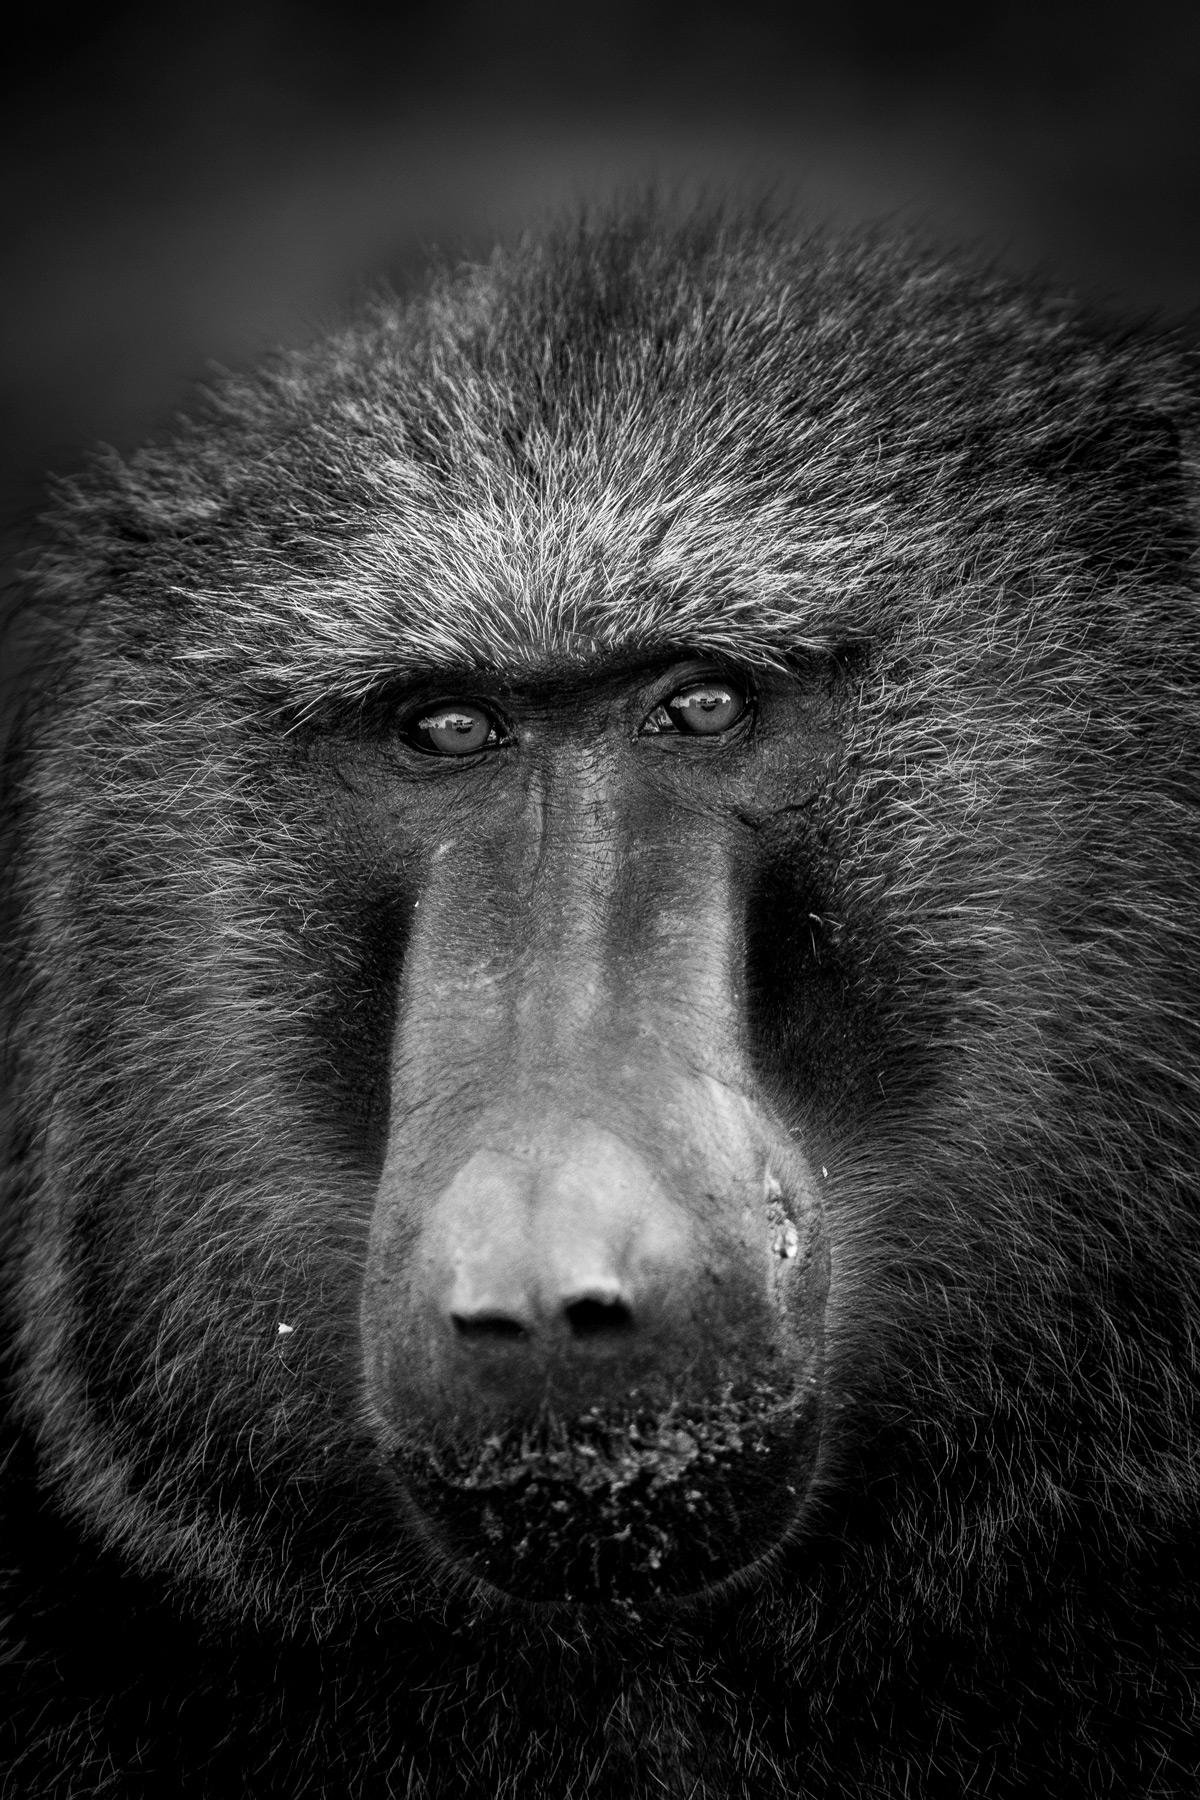 Portrait of a baboon, Maasai Mara National Reserve, Kenya © Patrice Quillard